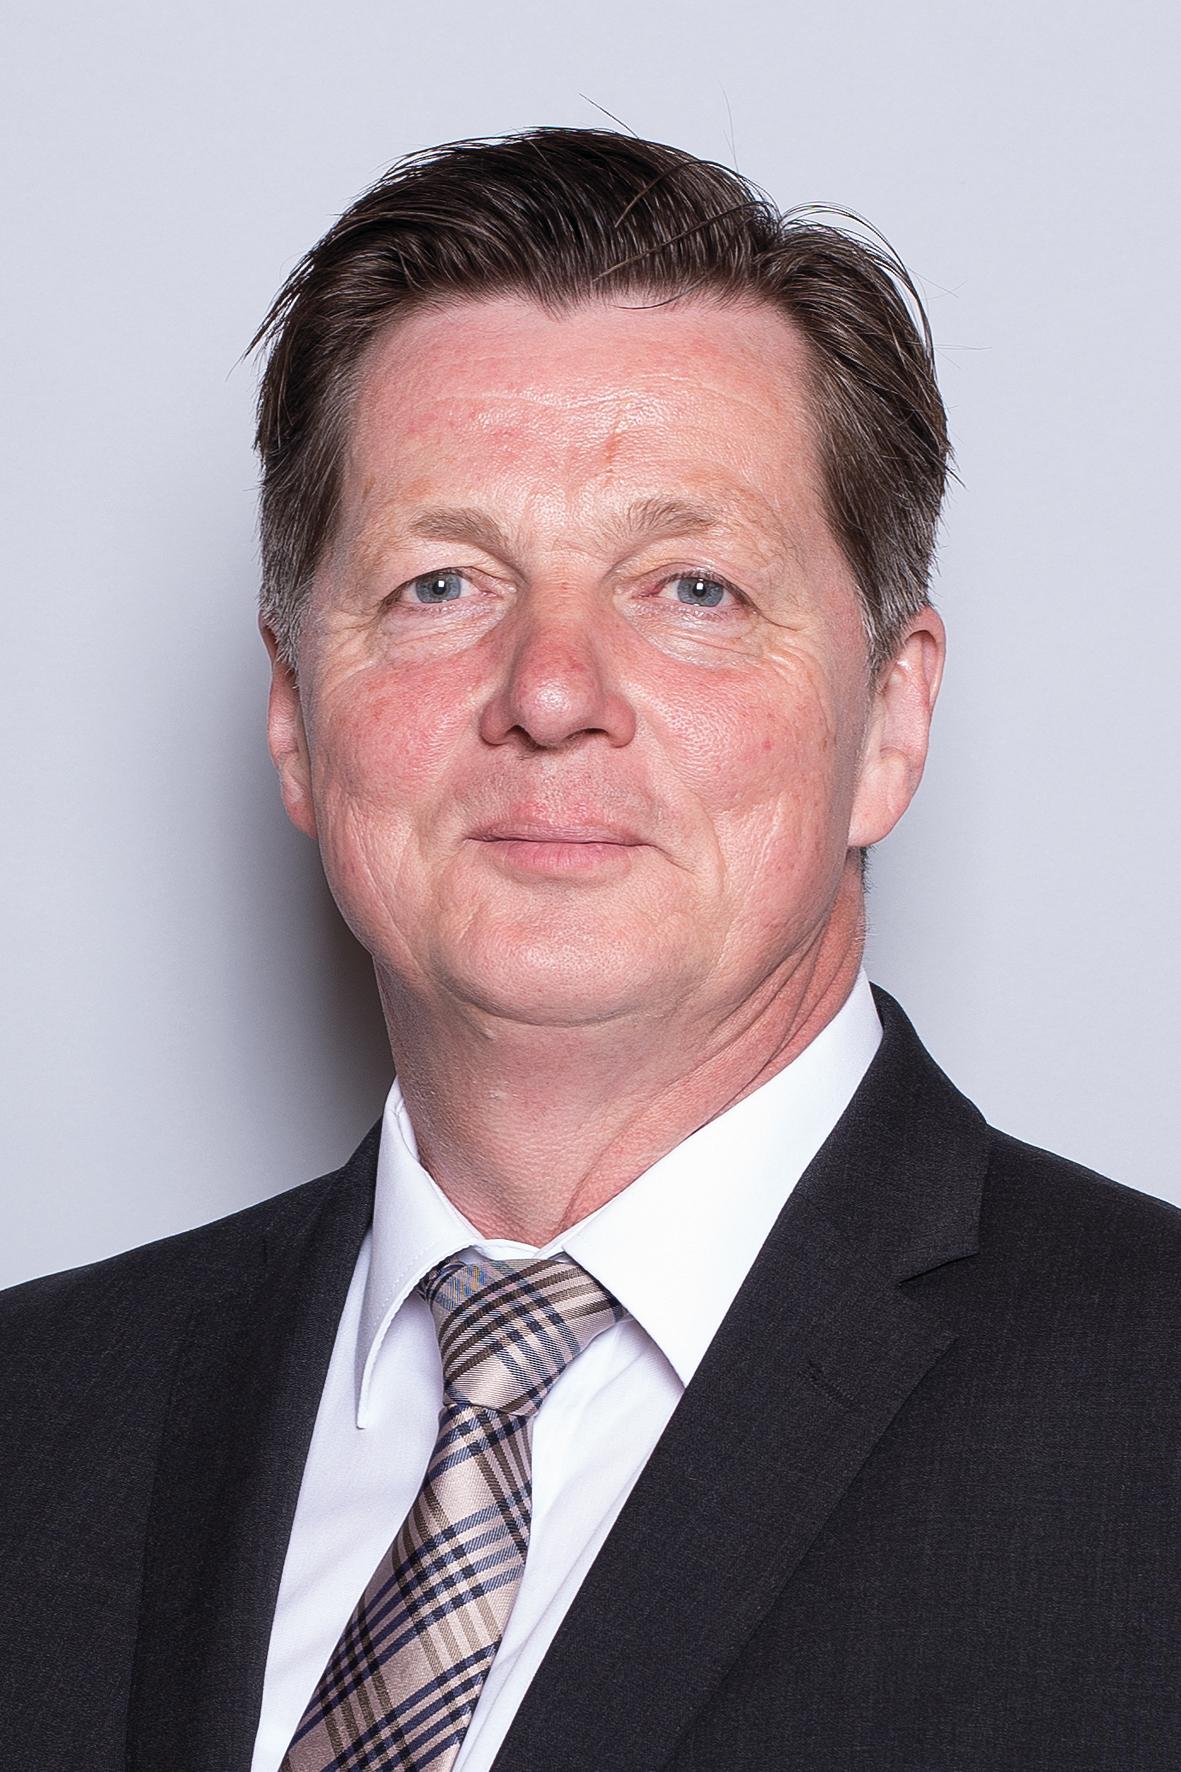 Eckhard Pols